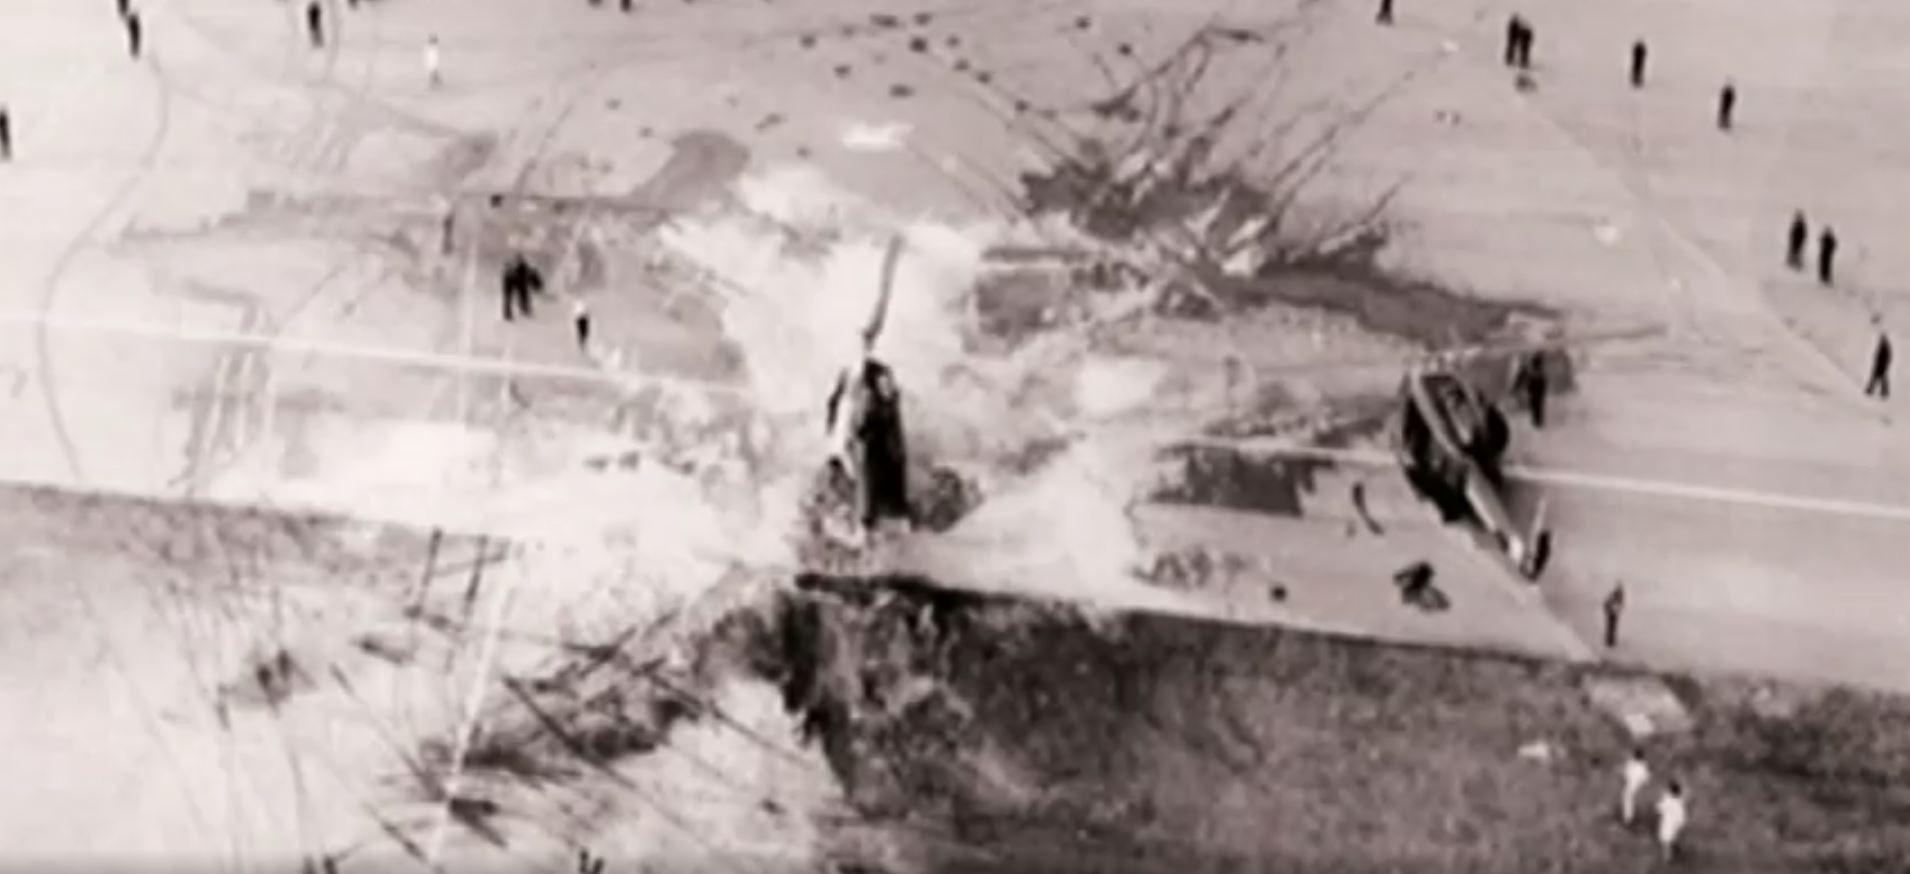 [:de]Olympia 1972 - sehenswerte Dokumentation in der ZDF Mediathek[:]